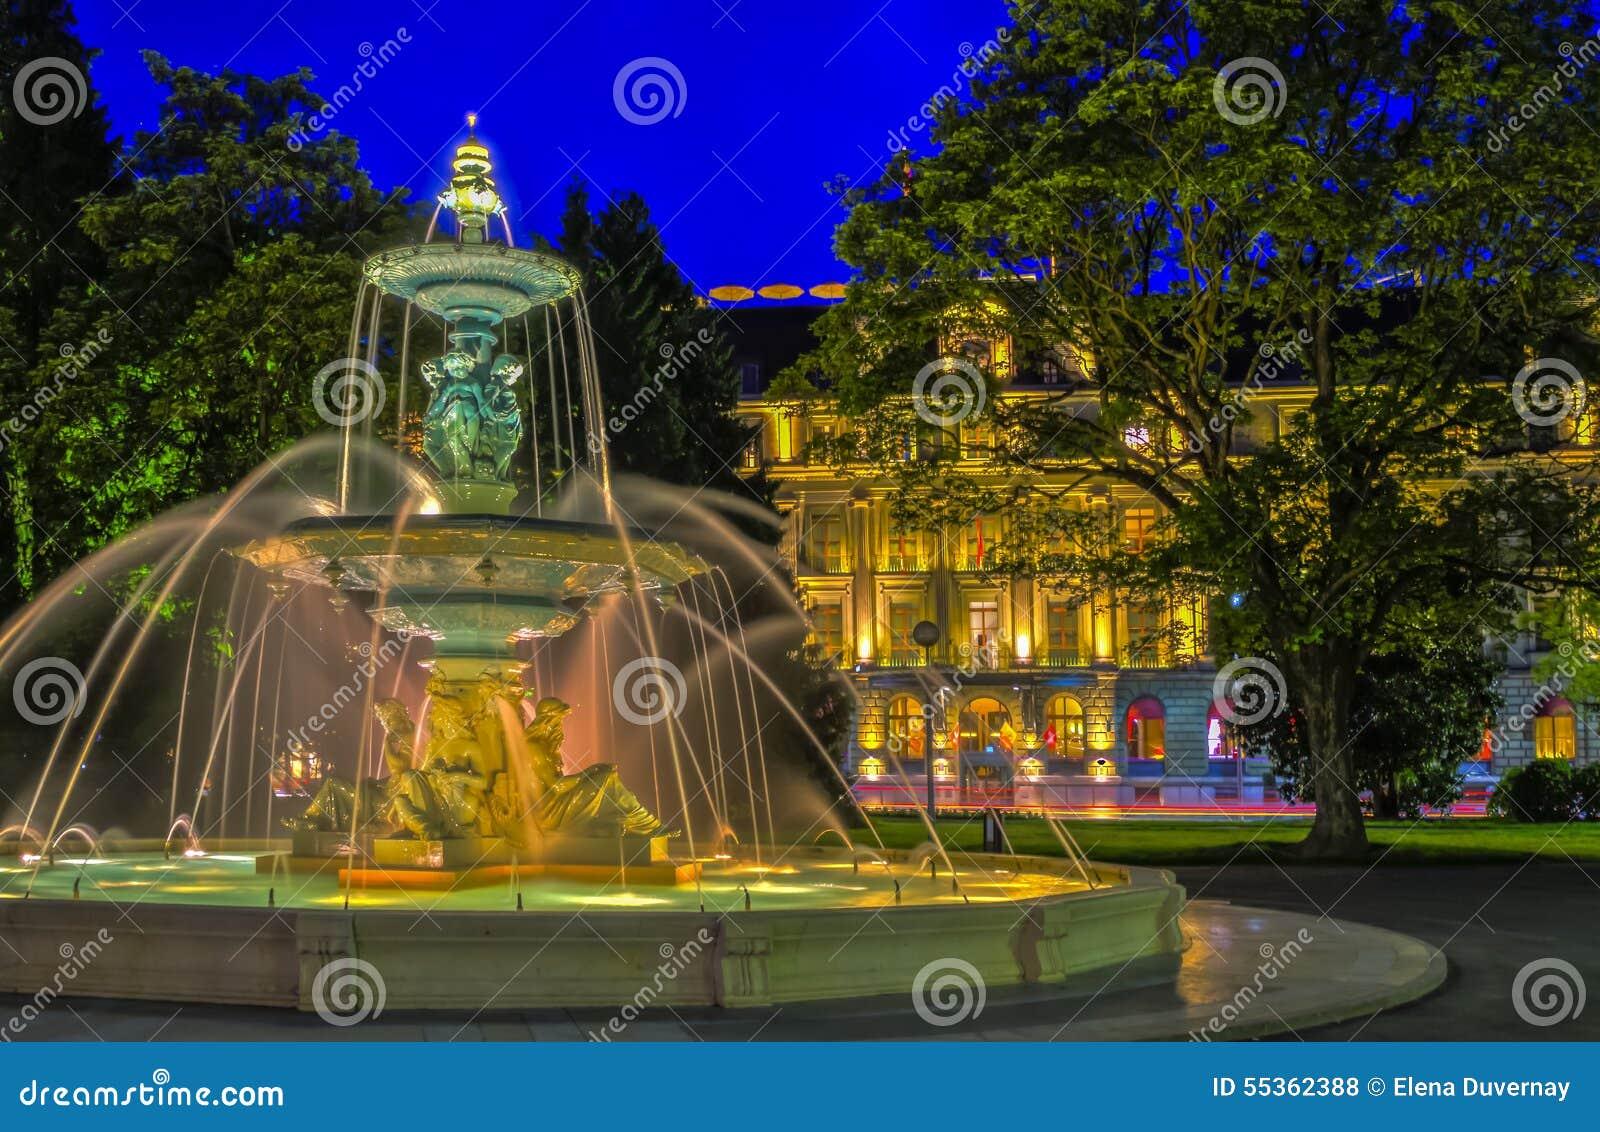 Fontaine au jardin anglais gen ve photo stock image for Jardin anglais geneve suisse